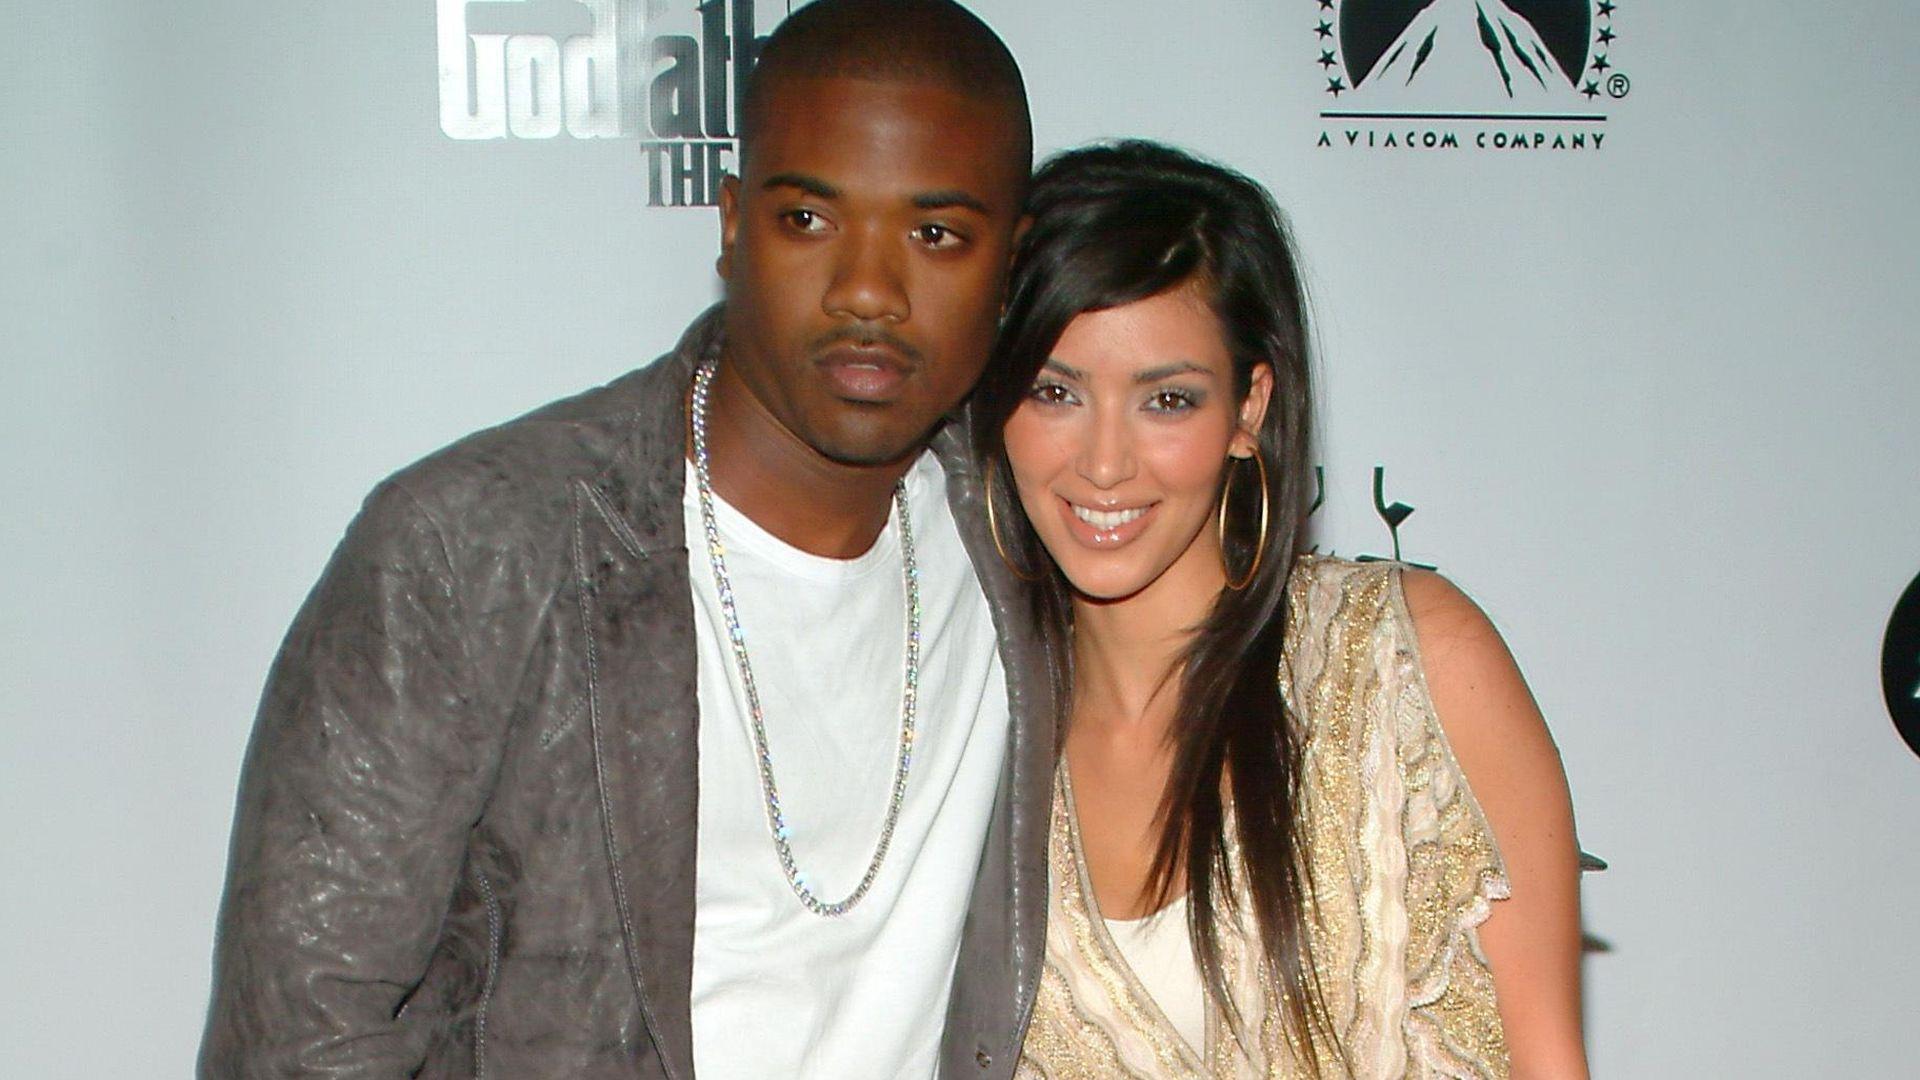 Ray j kim kardashian sex video pic 698